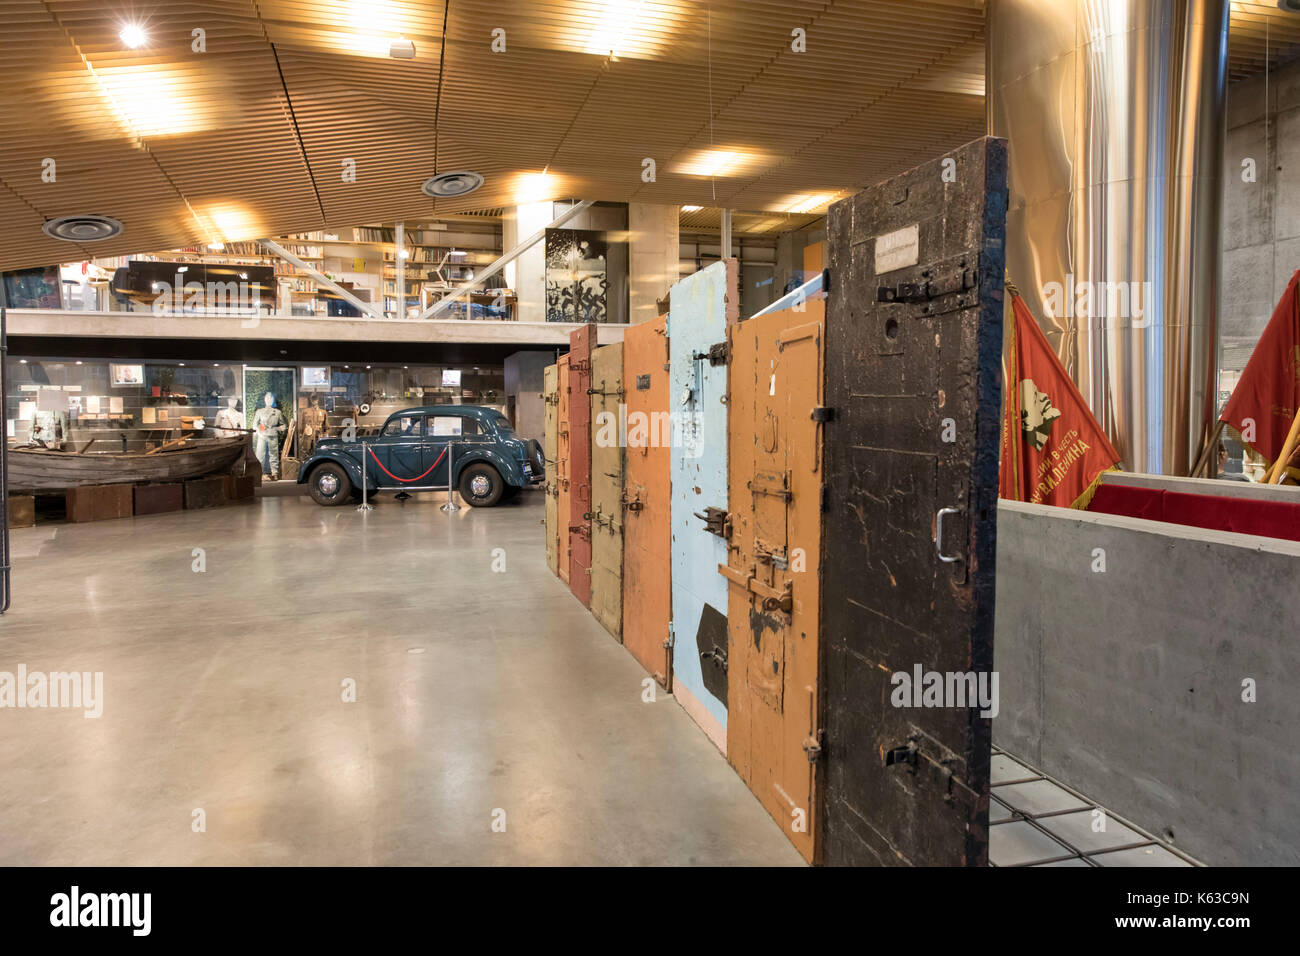 Museum of Occupations with prison doors, Tallinn, Estonia, Europe - Stock Image